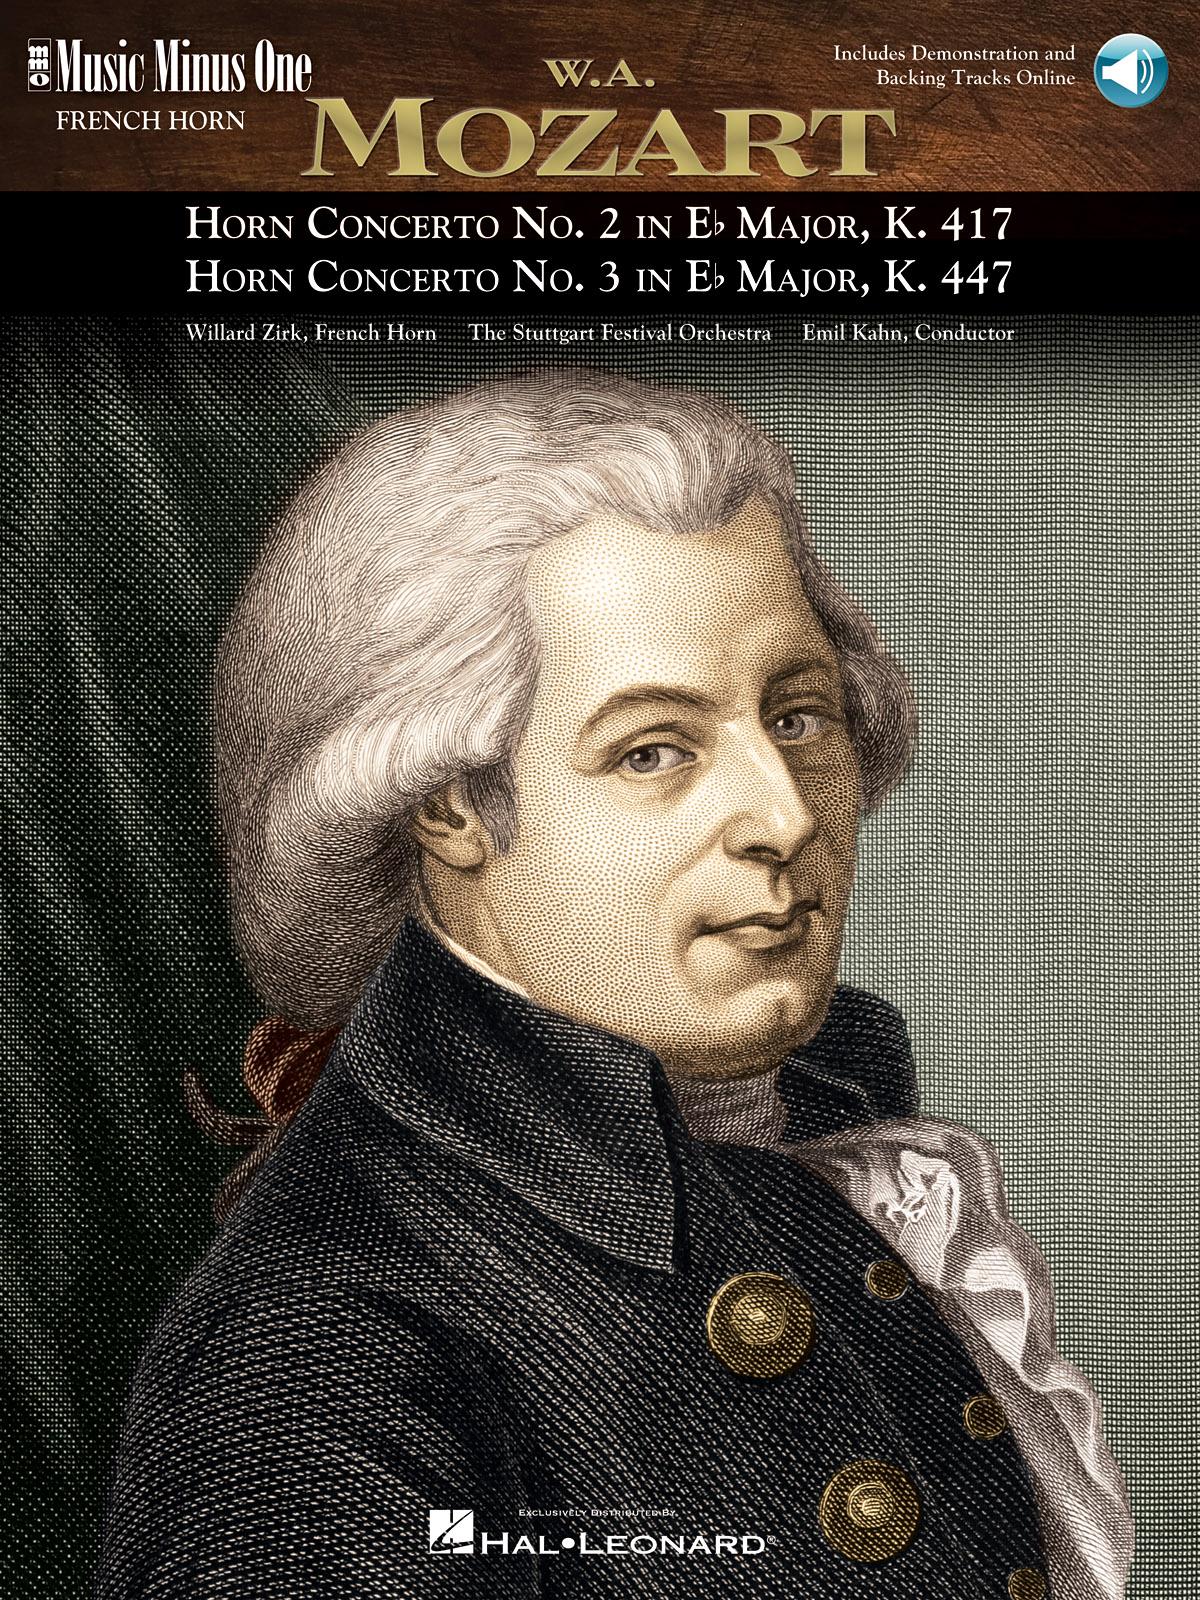 Wolfgang Amadeus Mozart: Horn Concerto No. 2 & Horn Concerto No. 3: French Horn